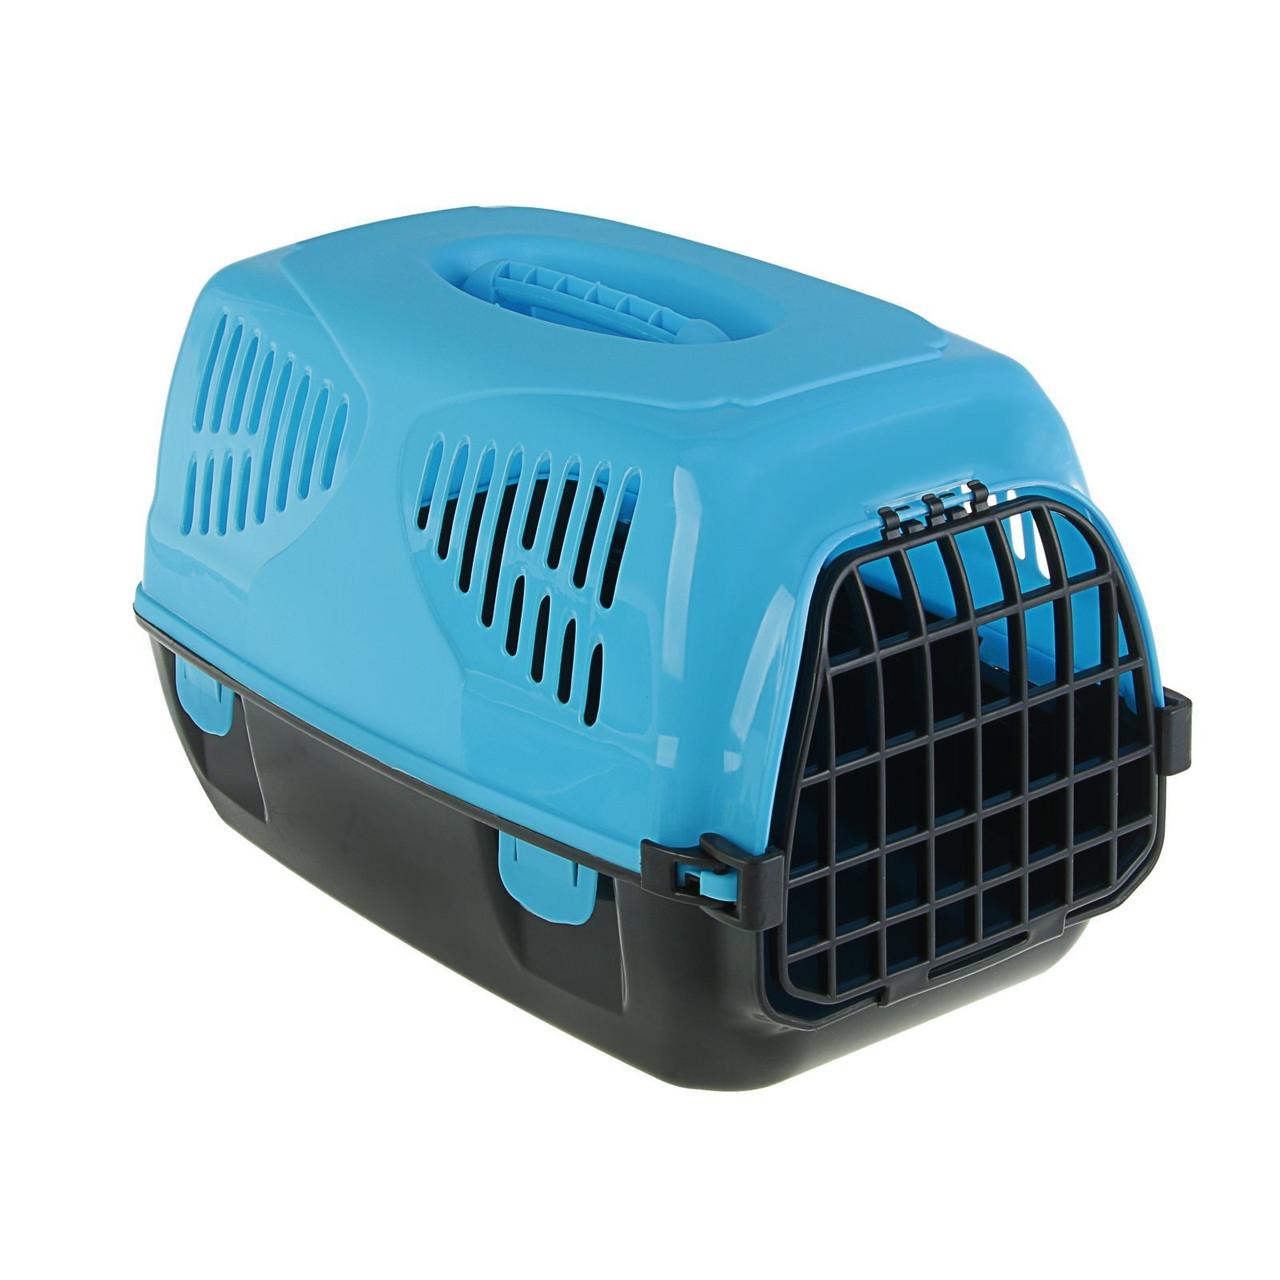 "Переноска для животных ""Сириус"" 33,5 х 31 х 50 см, цвет голубой"